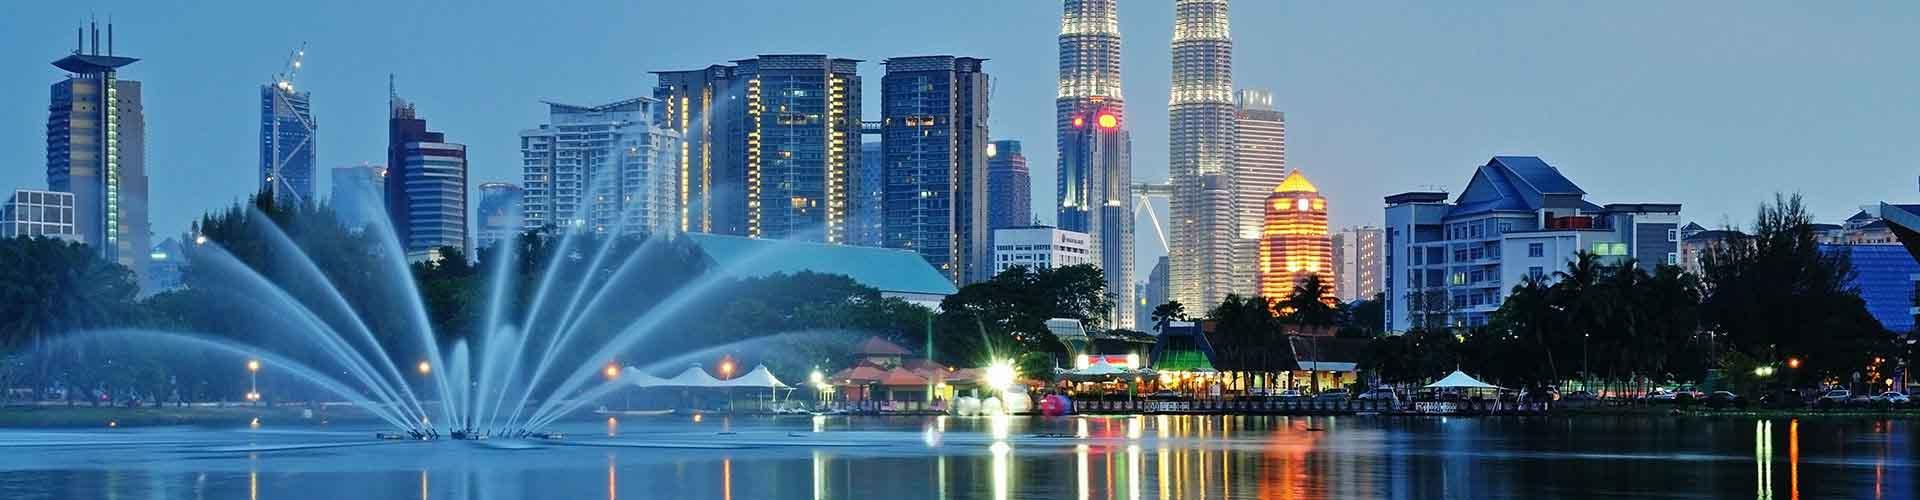 Kuala Lumpur - Albergues Juveniles en Kuala Lumpur. Mapas de Kuala Lumpur, Fotos y Comentarios para cada Albergue Juvenil en Kuala Lumpur.